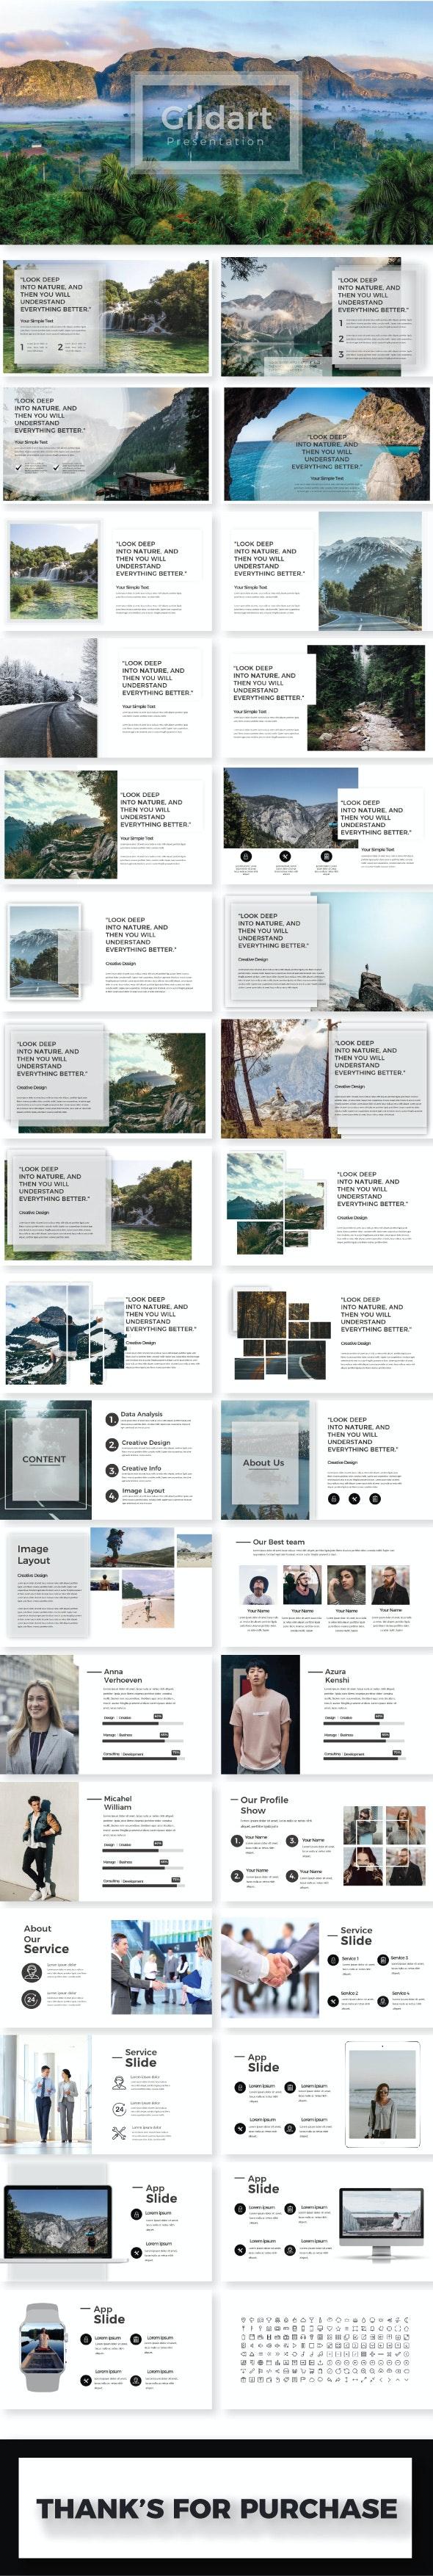 Gildart Google Slide Template - Google Slides Presentation Templates